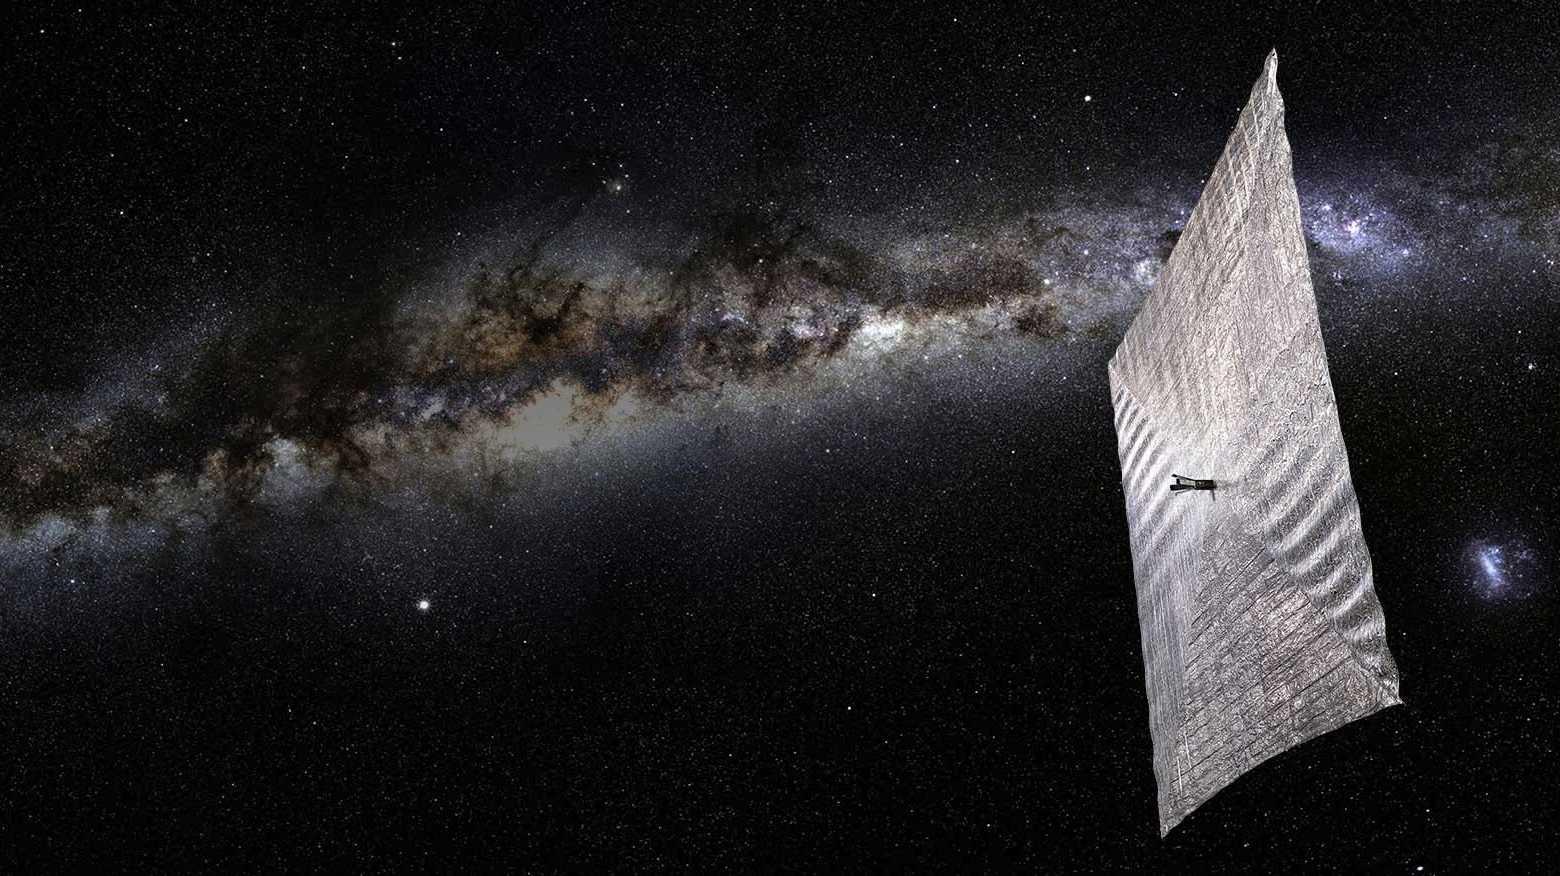 Experimentalsatellit LightSail 2: Sonnensegel aufgefaltet